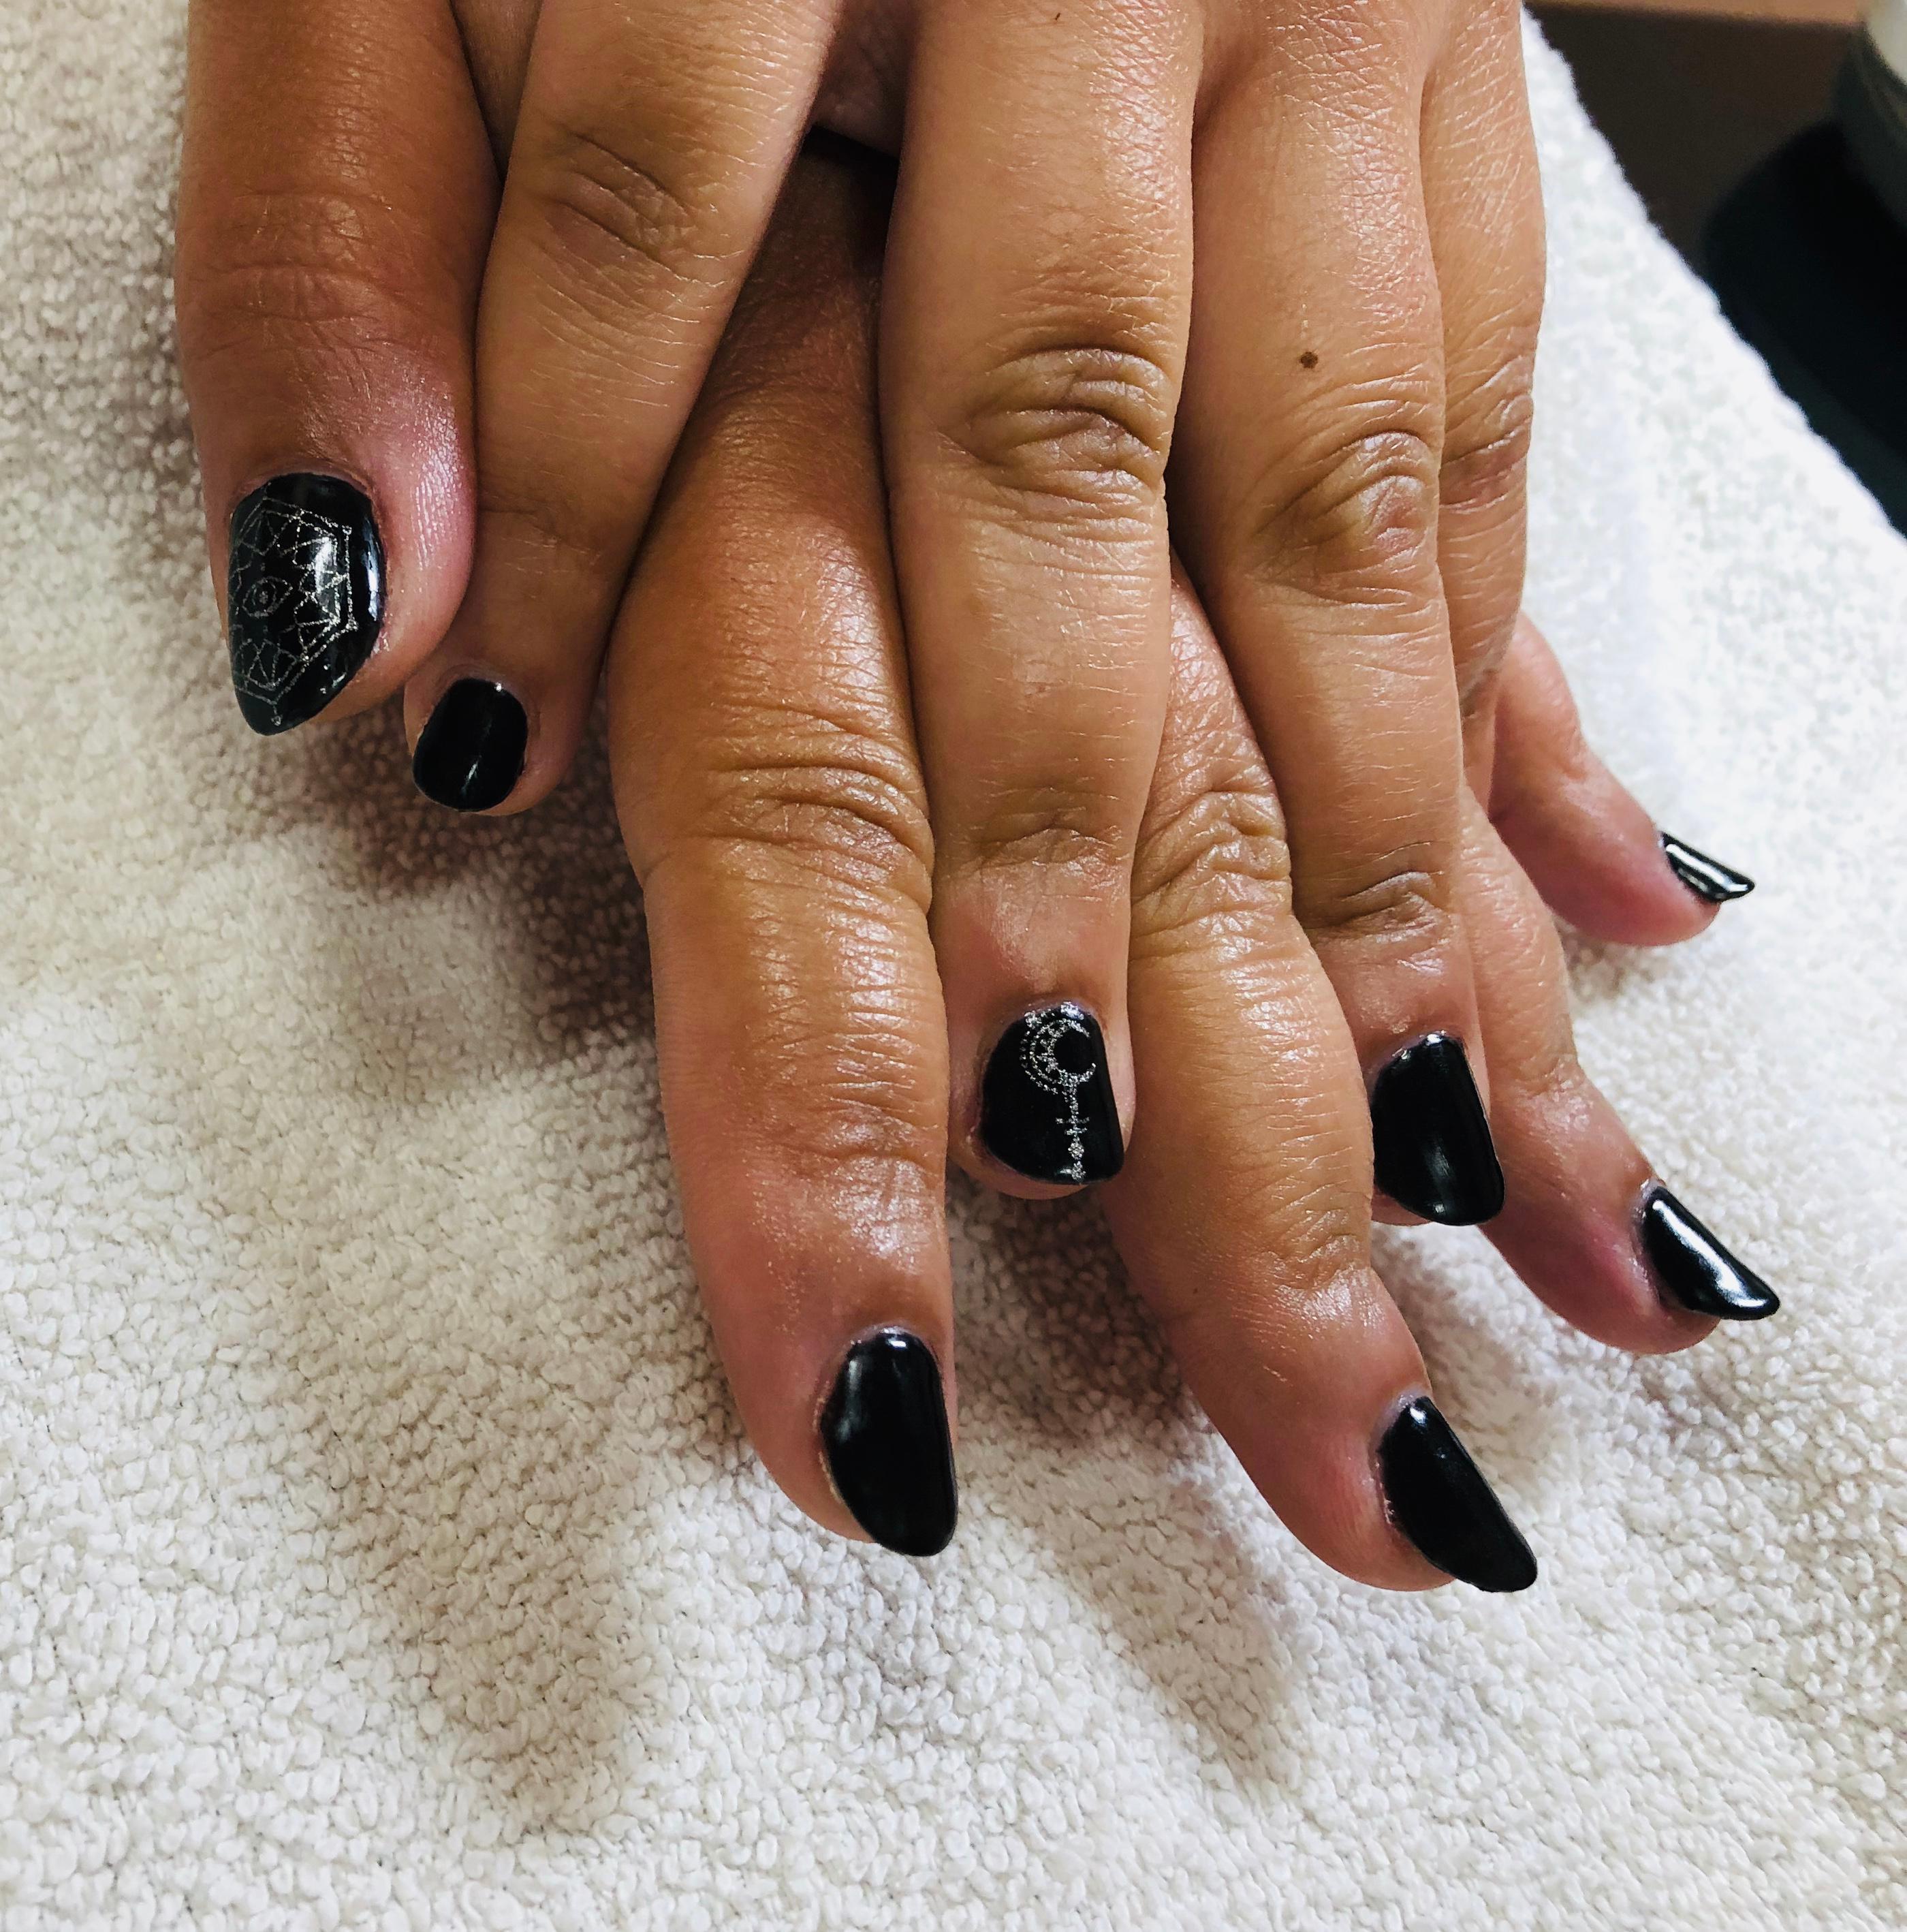 Bodyscapes Salon & Beauty Spa image 68